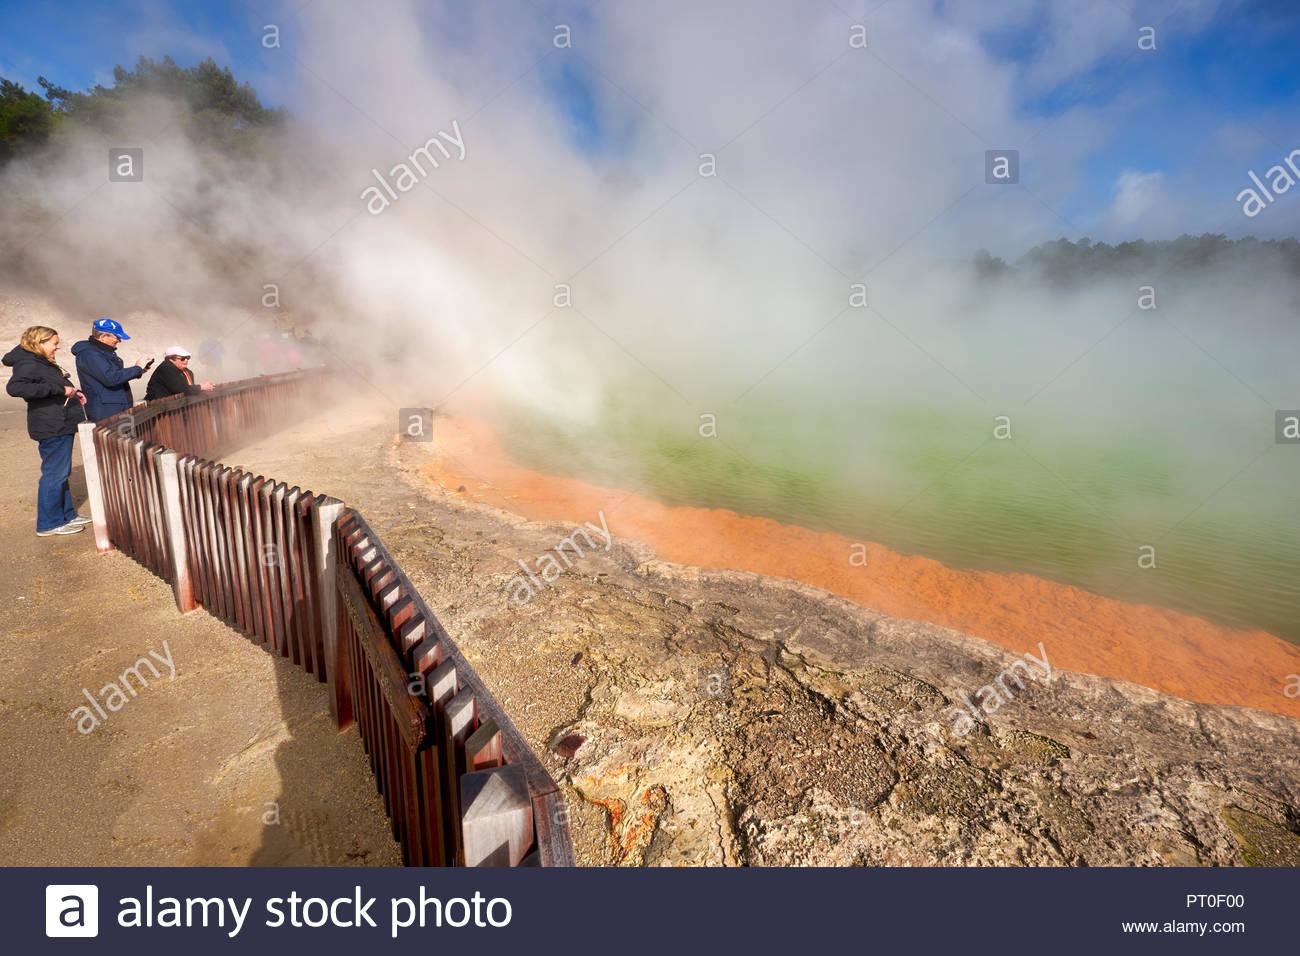 Wai O Tapu geothermal area. Rotorua New Zealand. The Champagne Pool - Stock Image